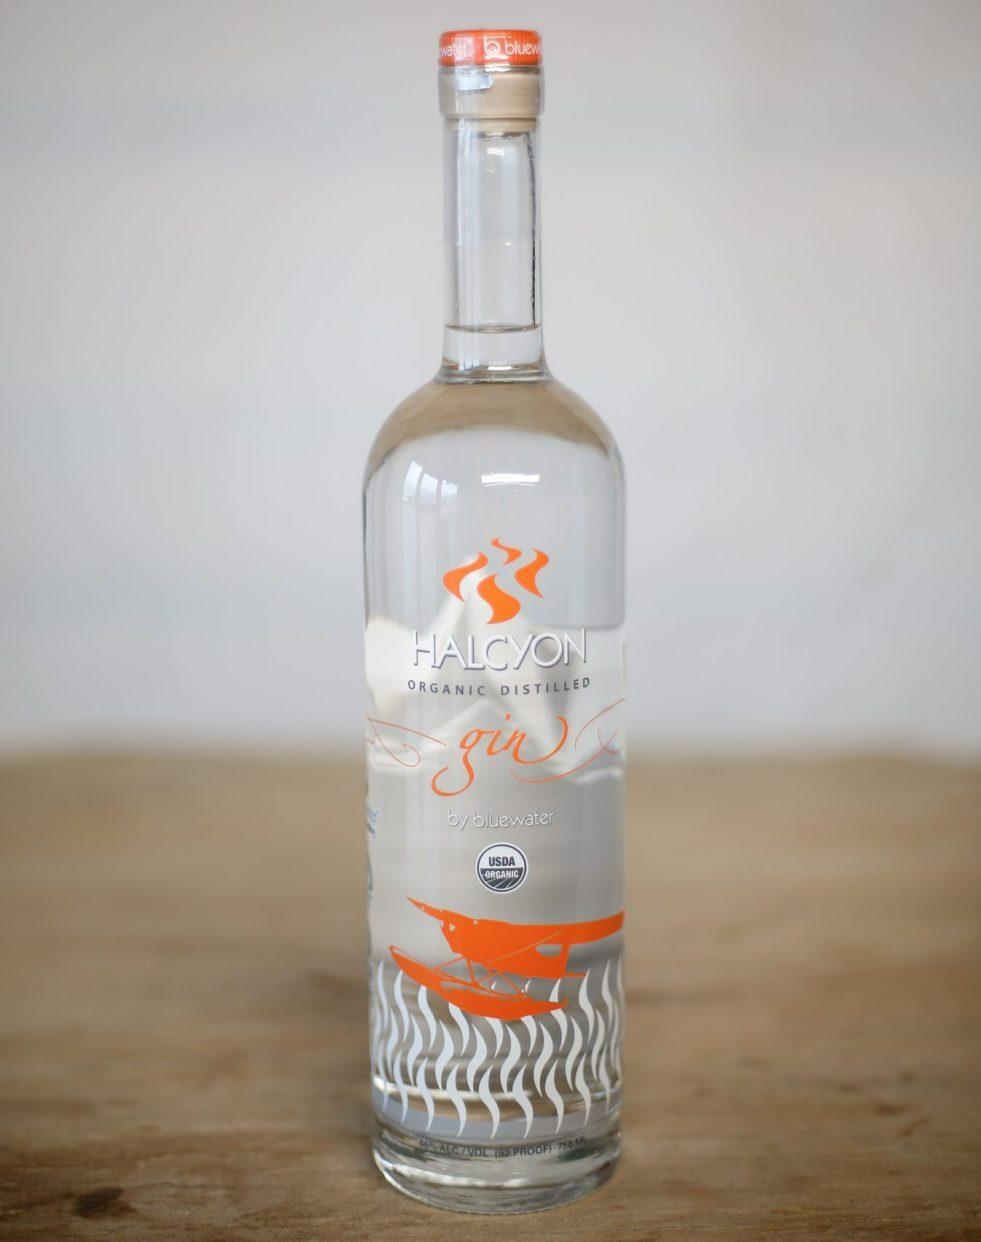 Halcyon Organic Distilled Gin 36 50